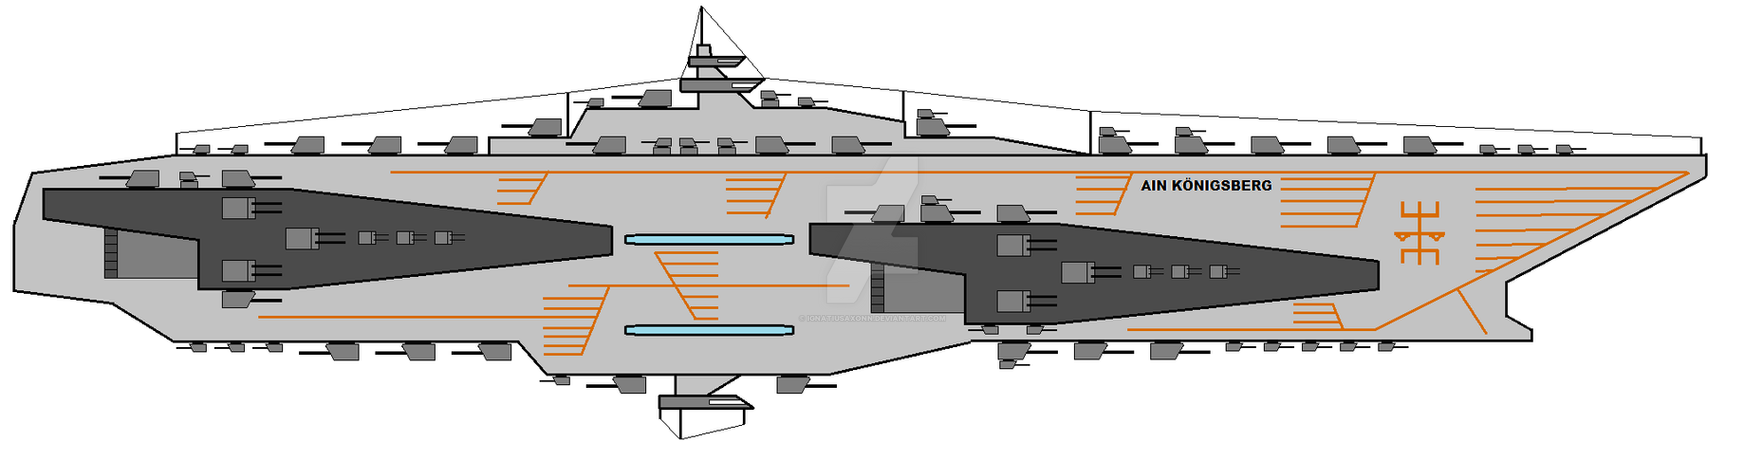 Konigsberg class light cruiser by IgnatiusAxonn